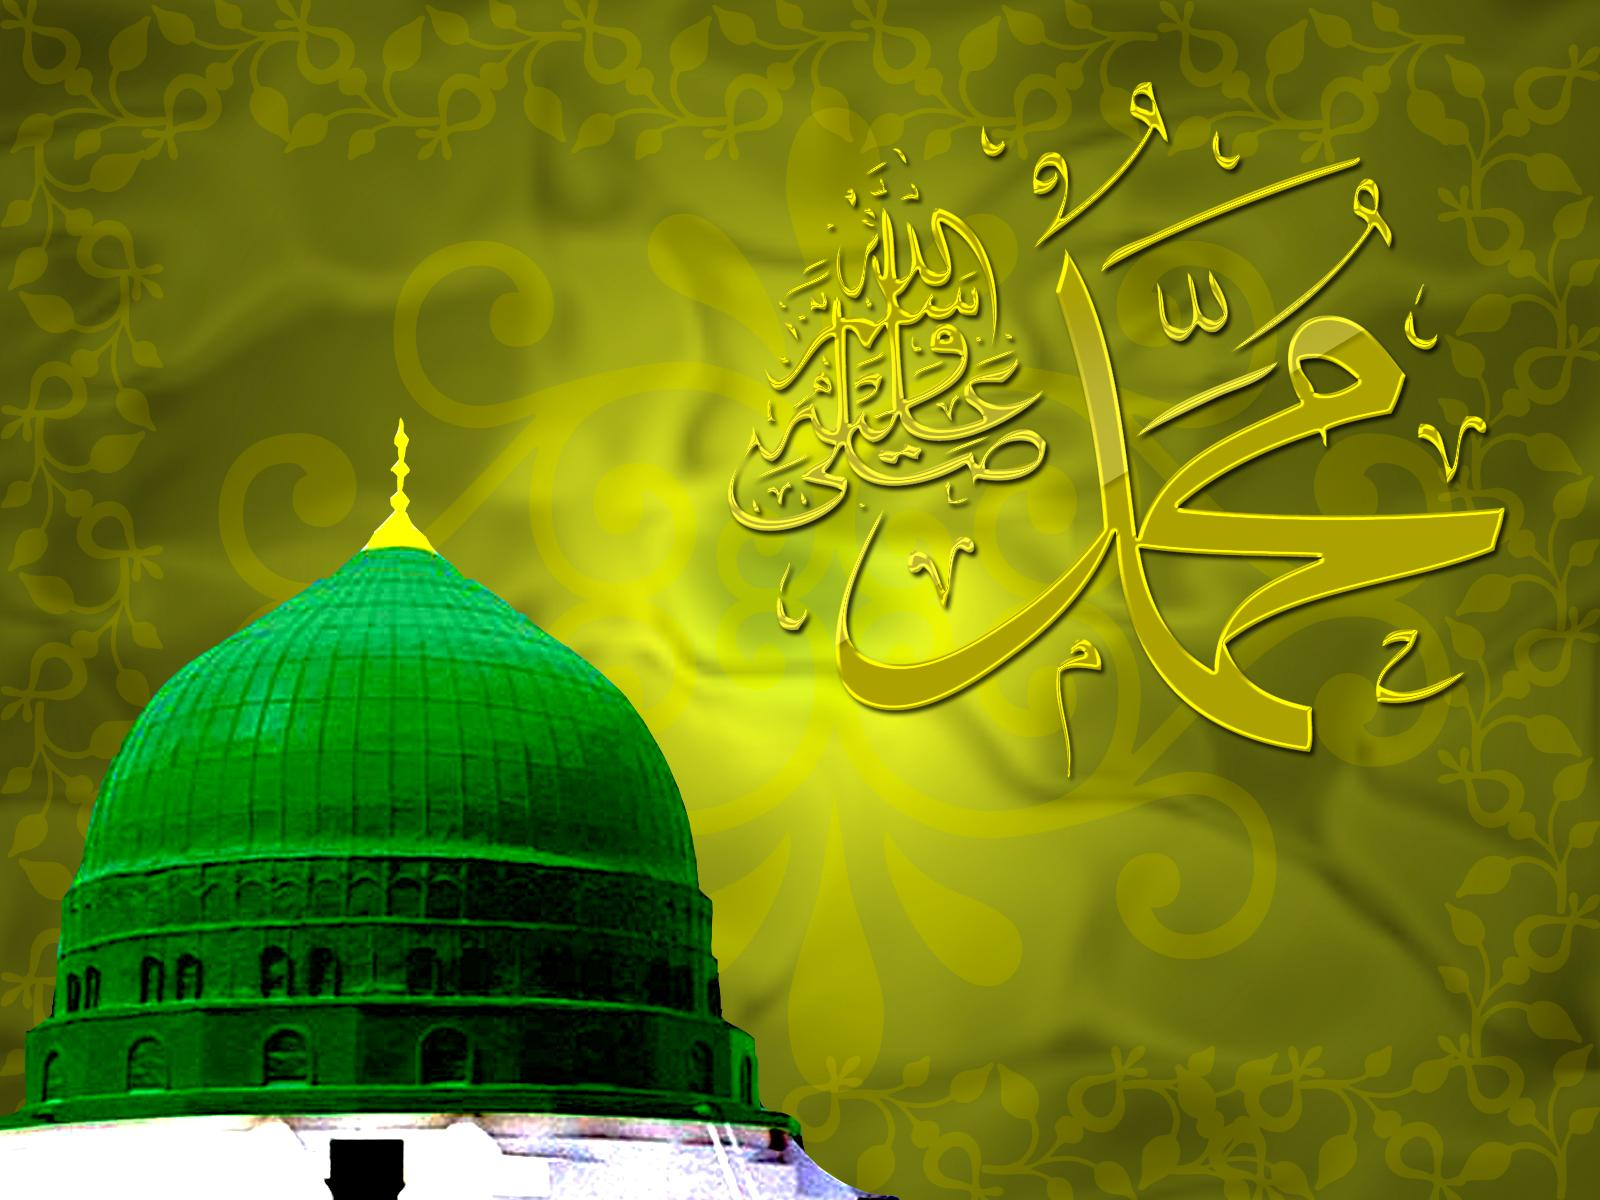 http://1.bp.blogspot.com/-0Mxhphp6U4s/T2Bkcv2cNCI/AAAAAAAAApA/iSDIq8jHAec/s1600/Wallpaper+Muhammad+Rasulullah+%252826%2529.jpg